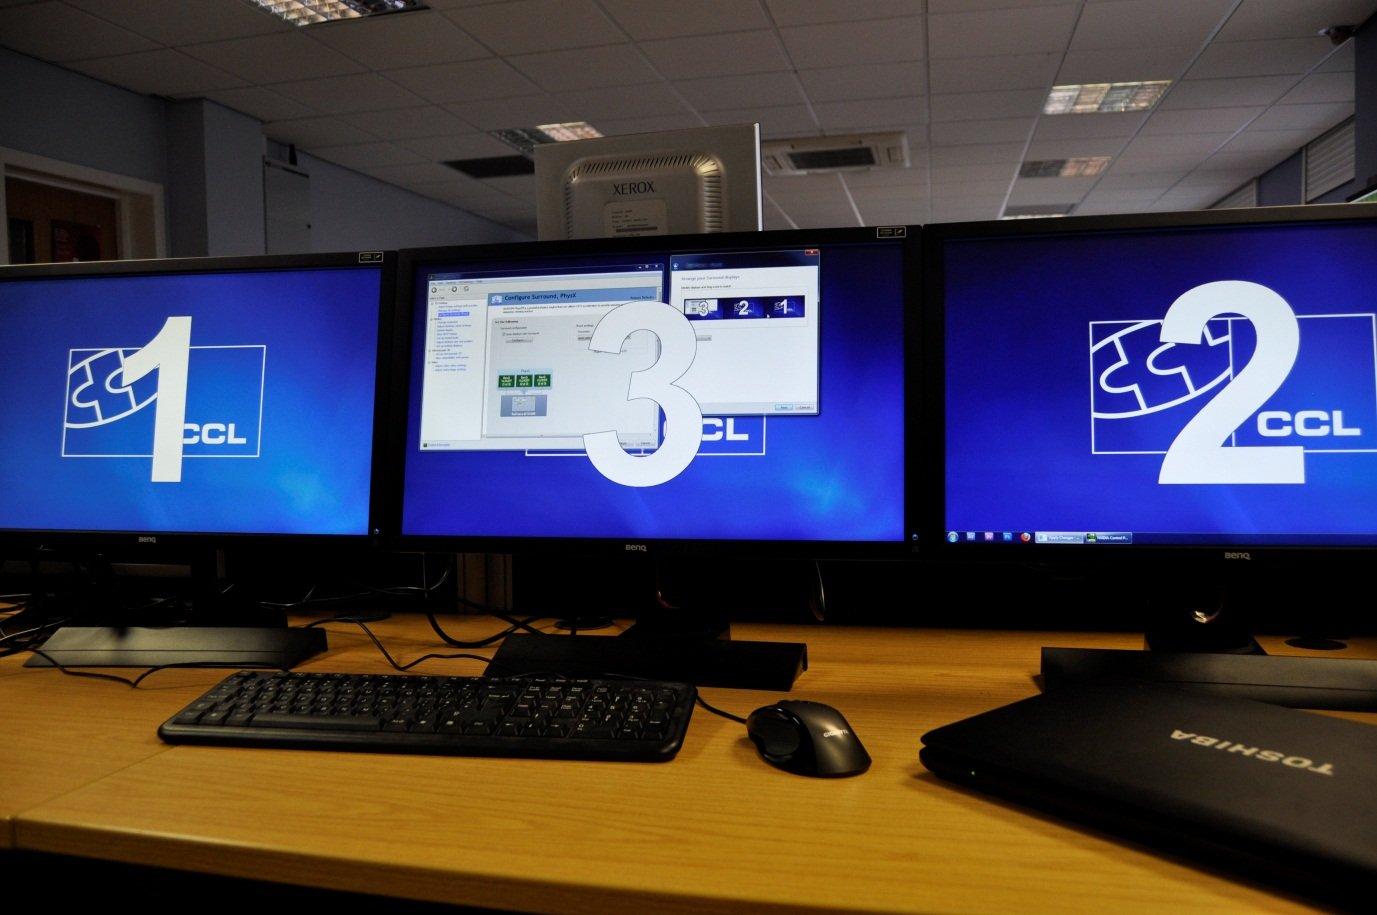 Configuring Multiple Monitors Nvidia Surround Single